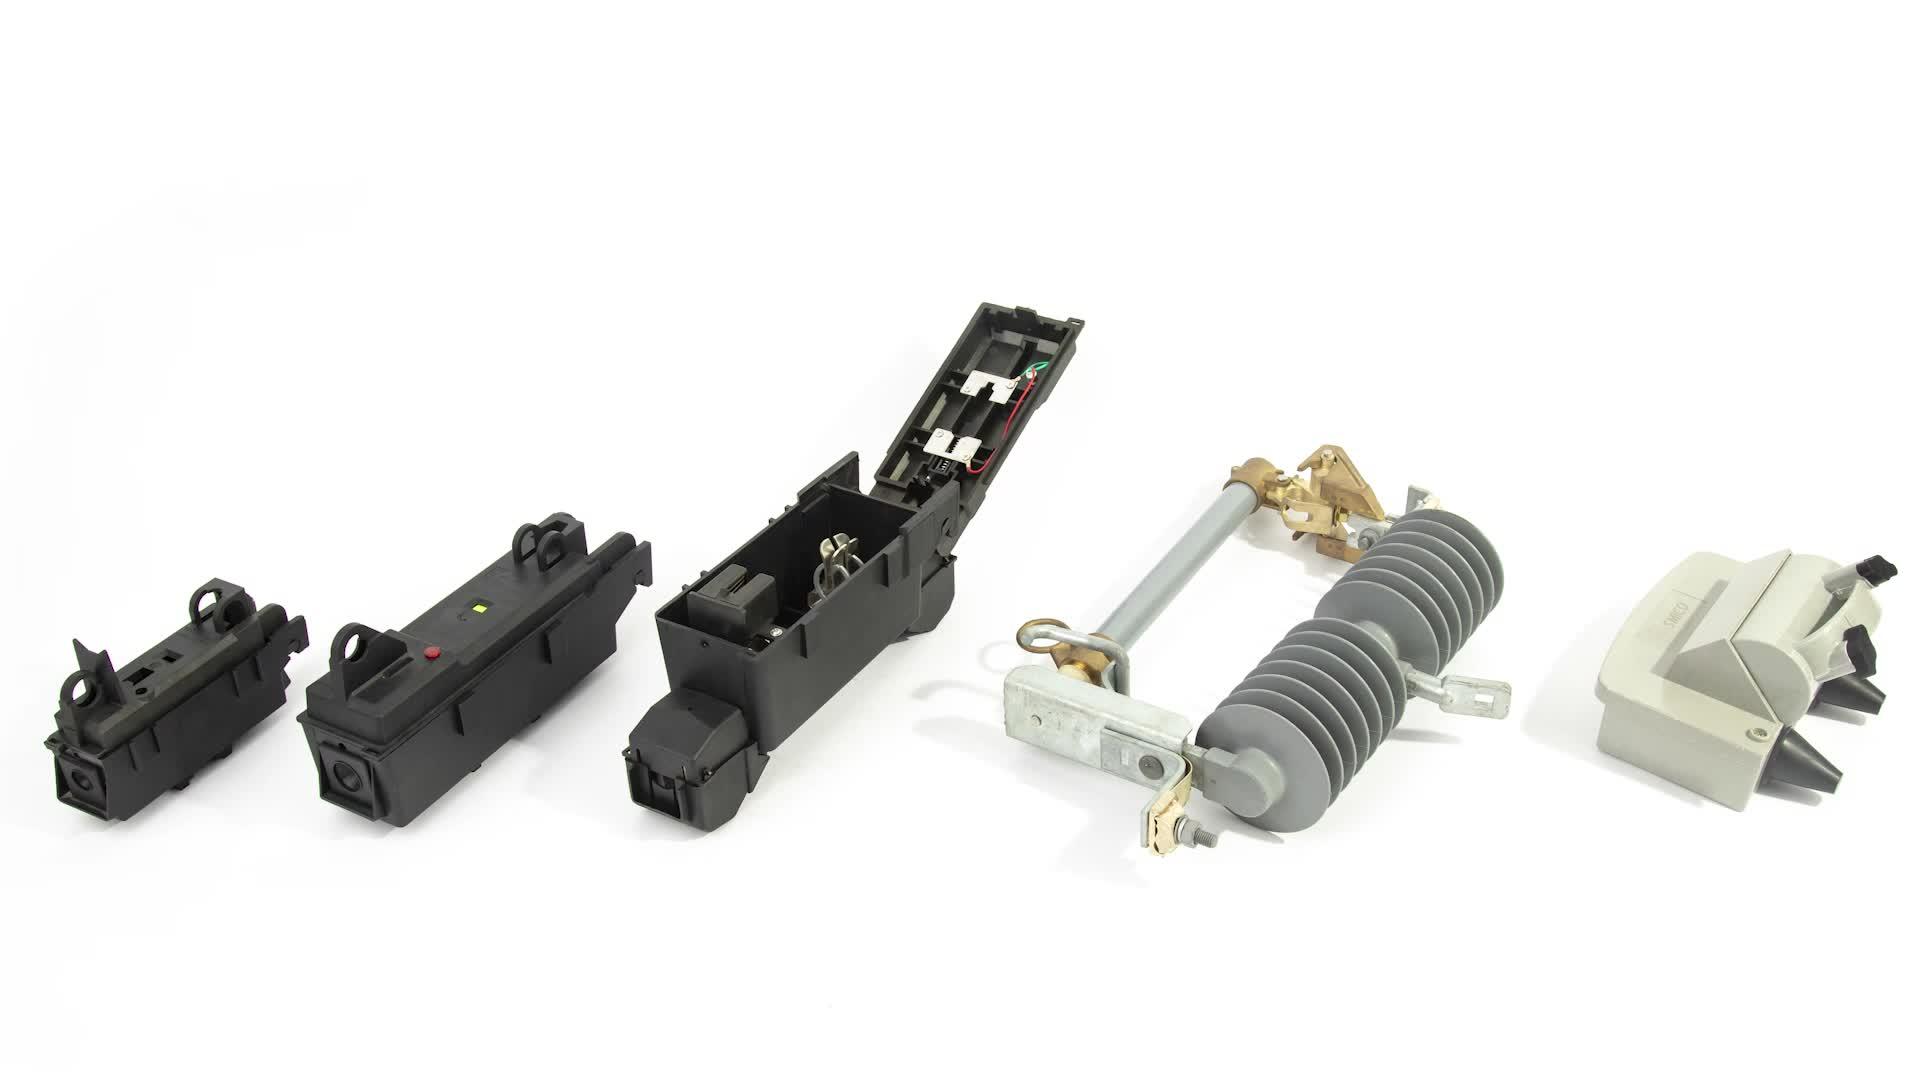 24-27KV high voltage outdoor expulsion dropout fuse cutout polymer fuse cutout